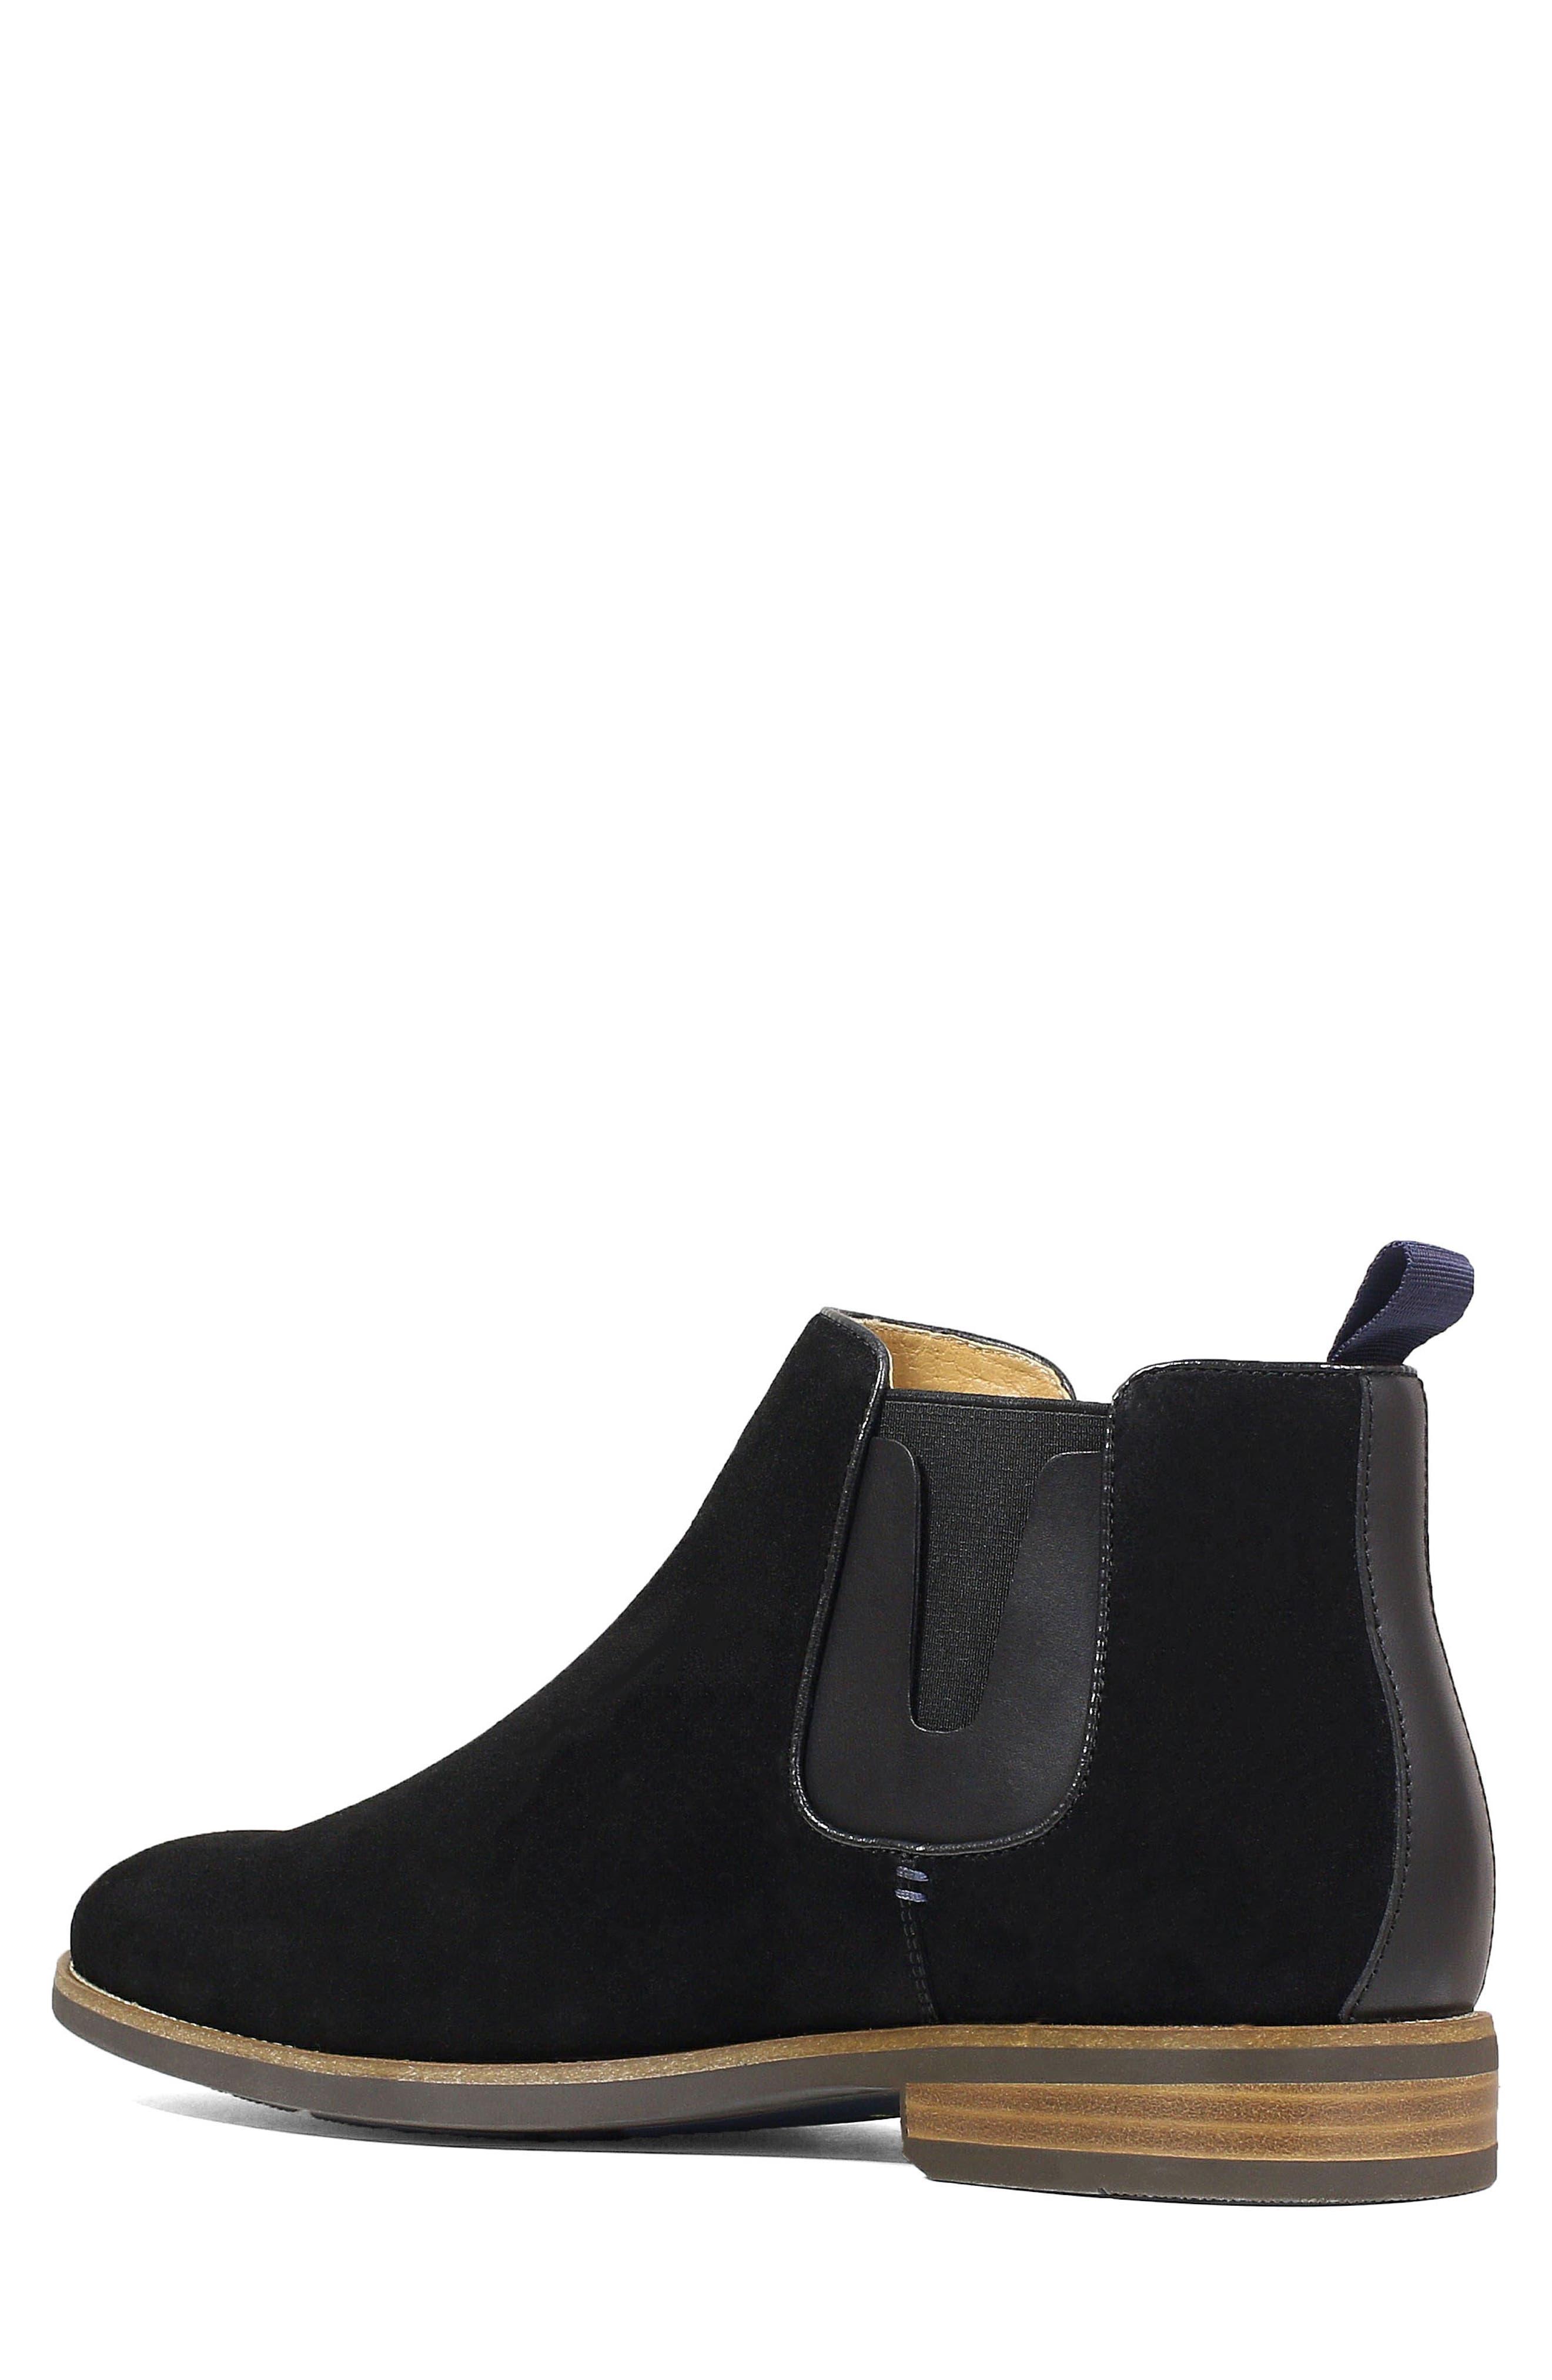 Uptown Plain Toe Mid Chelsea Boot,                             Alternate thumbnail 2, color,                             BLACK SUEDE